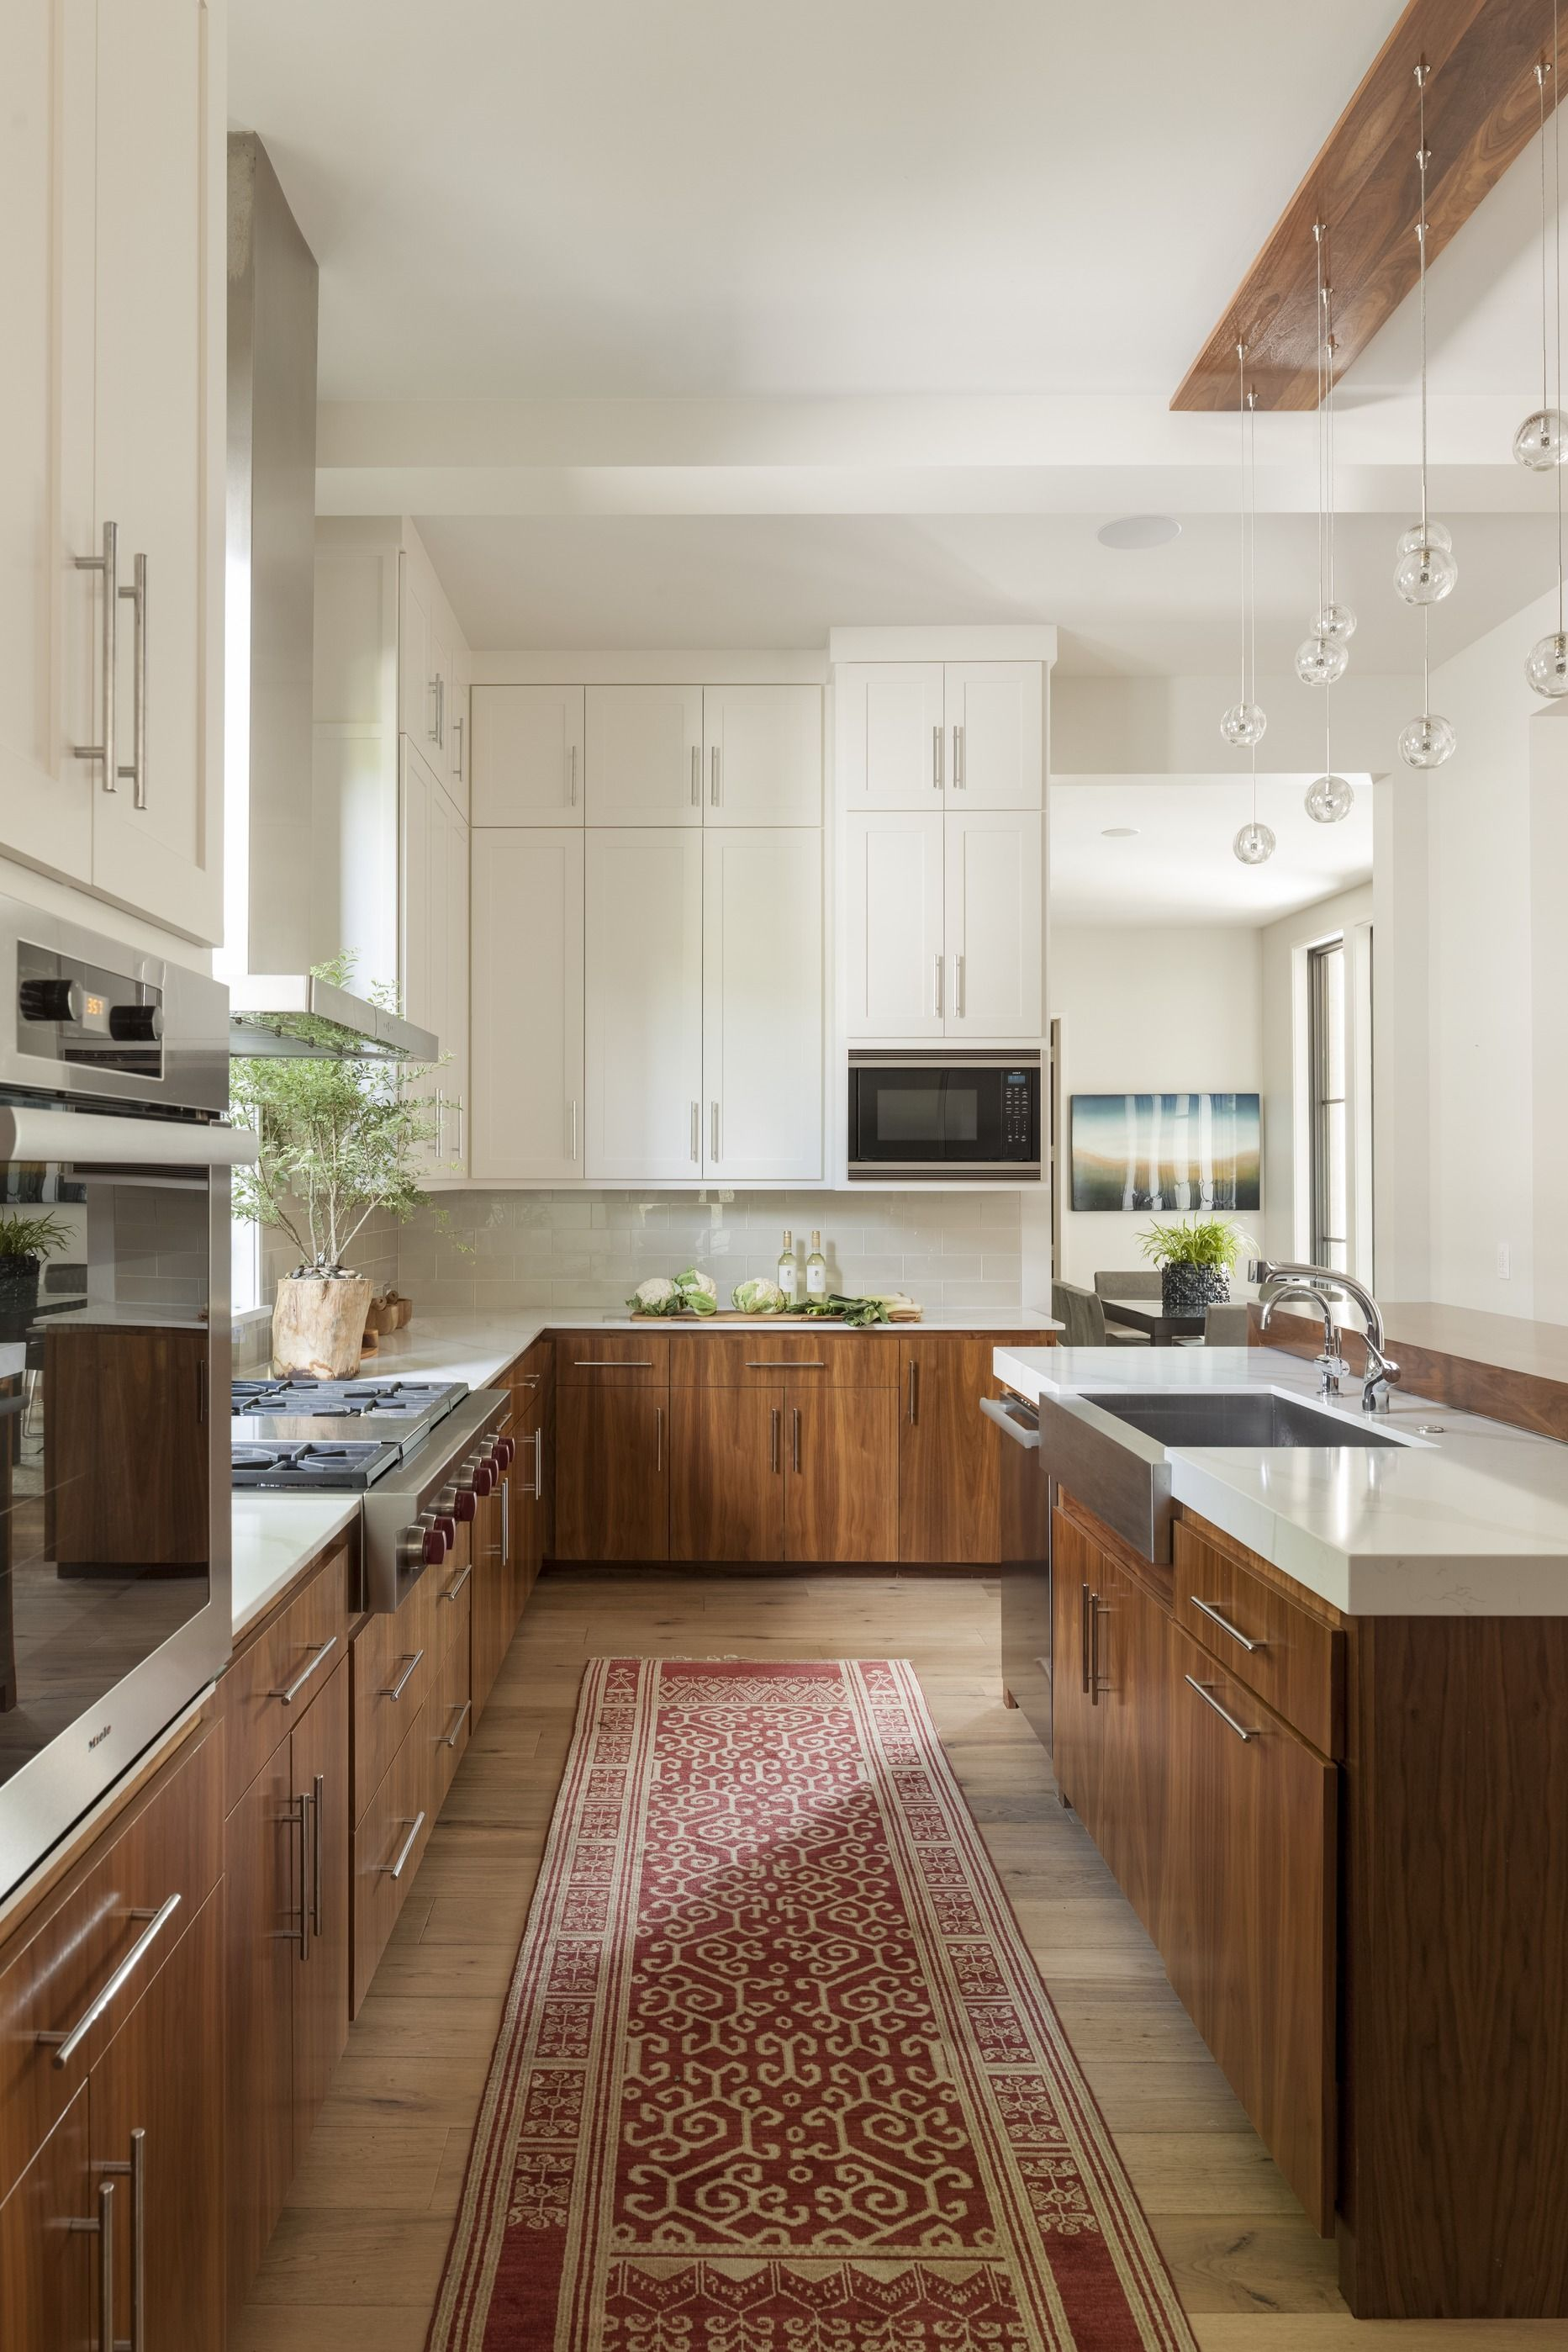 33 Creative Kitchen Cabinet Ideas Trend In 2019 Sooziq Com